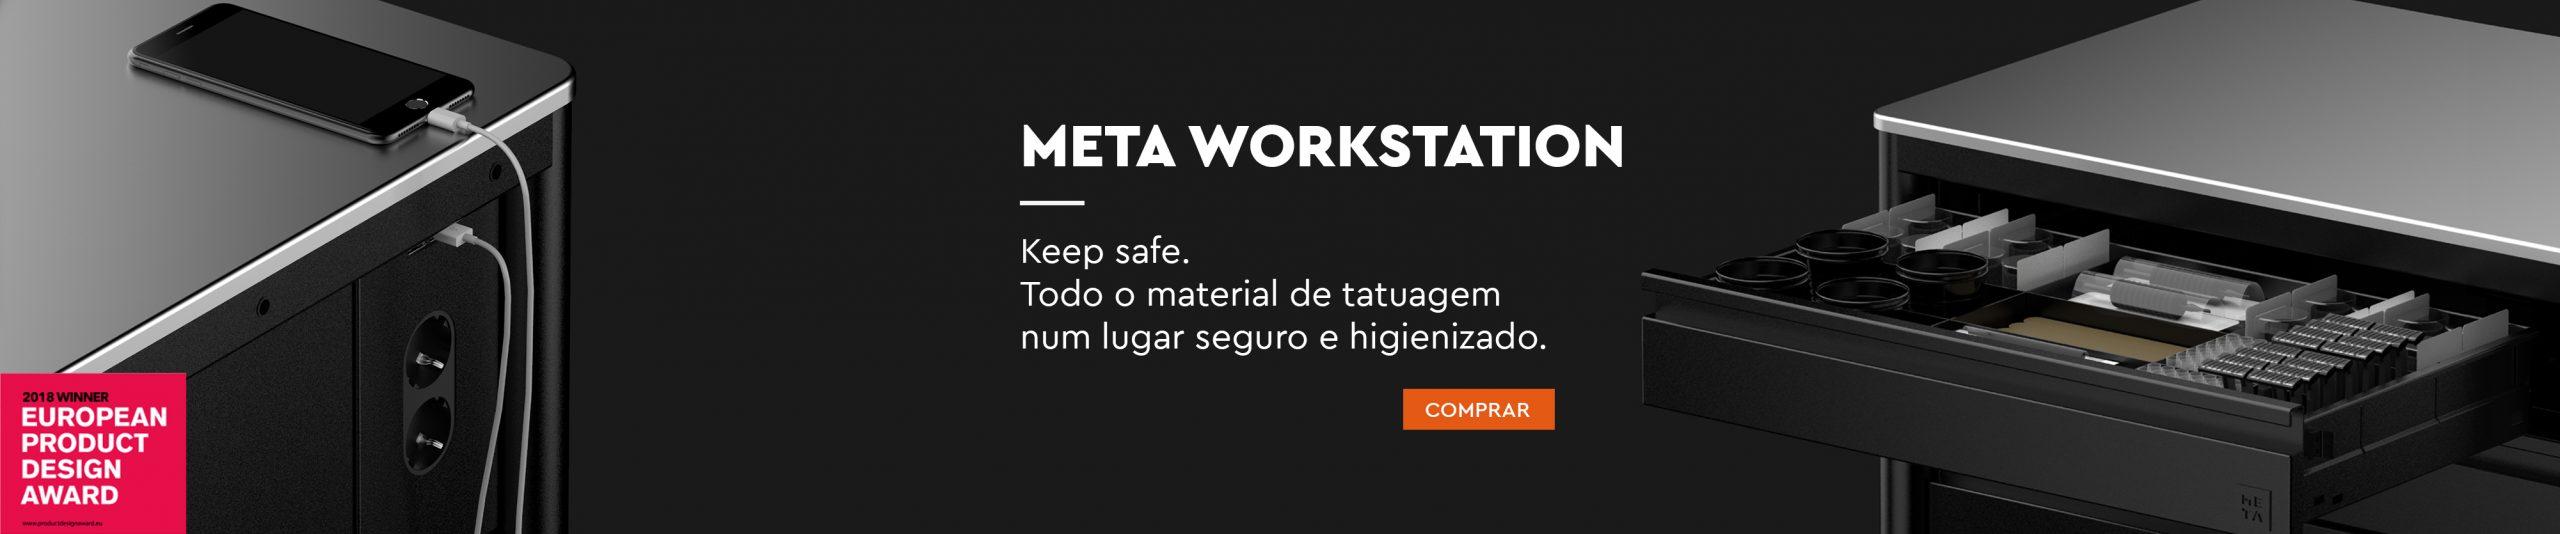 meta workstation